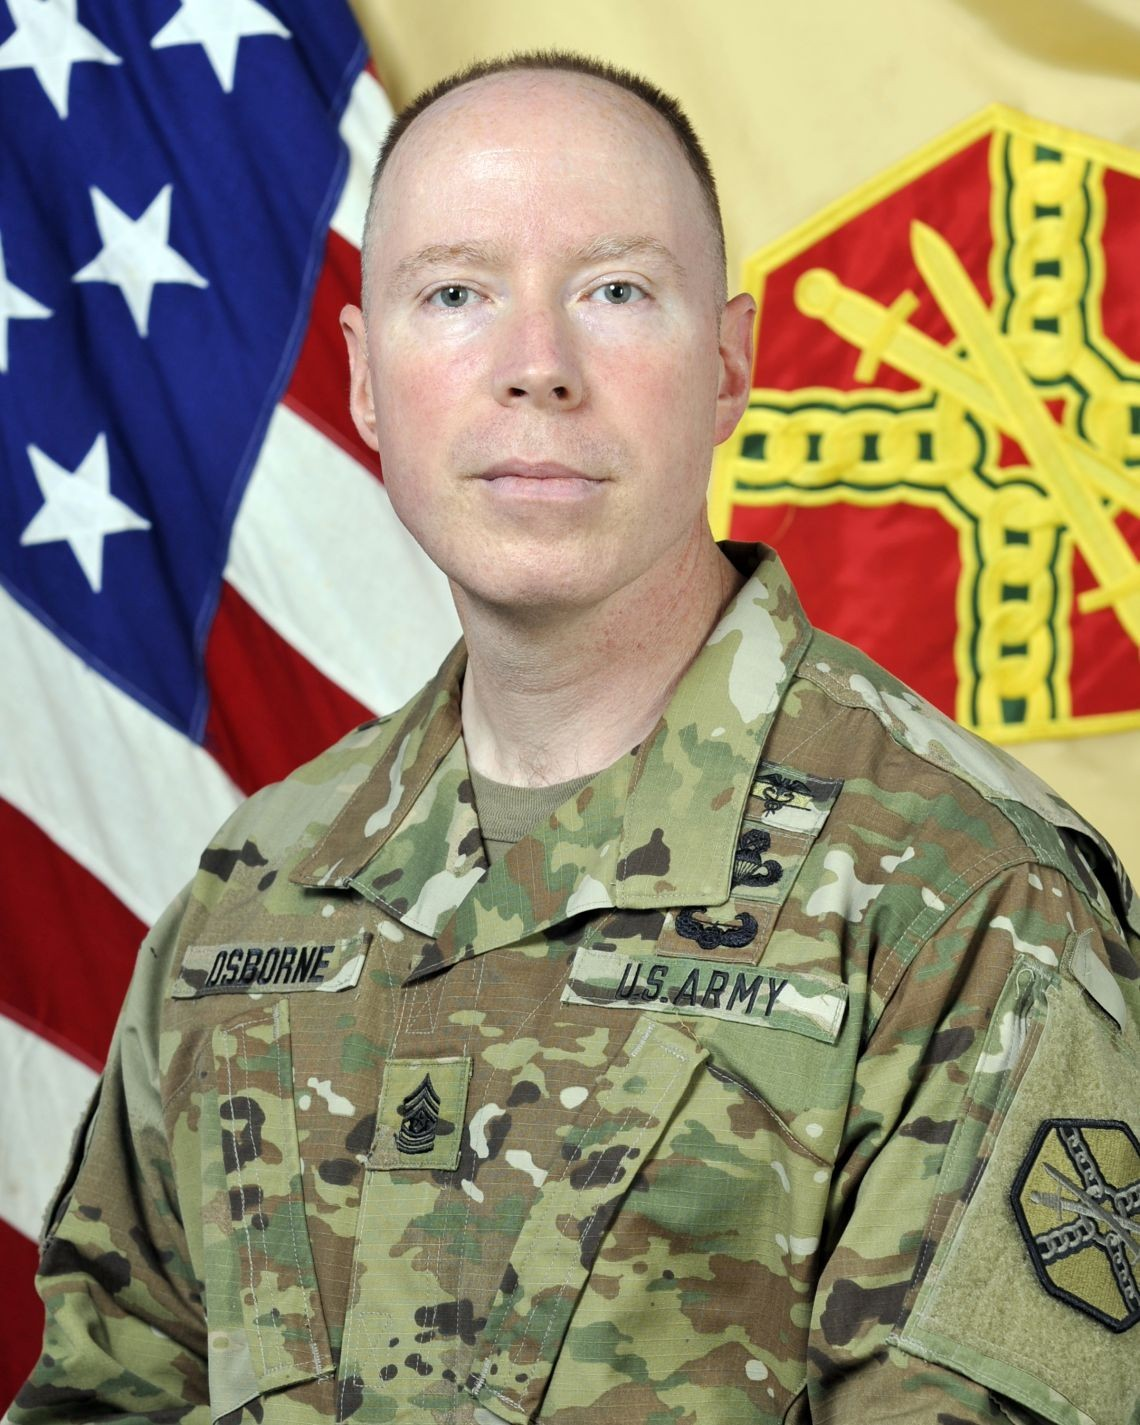 Command Sgt. Maj. Jason Osborne